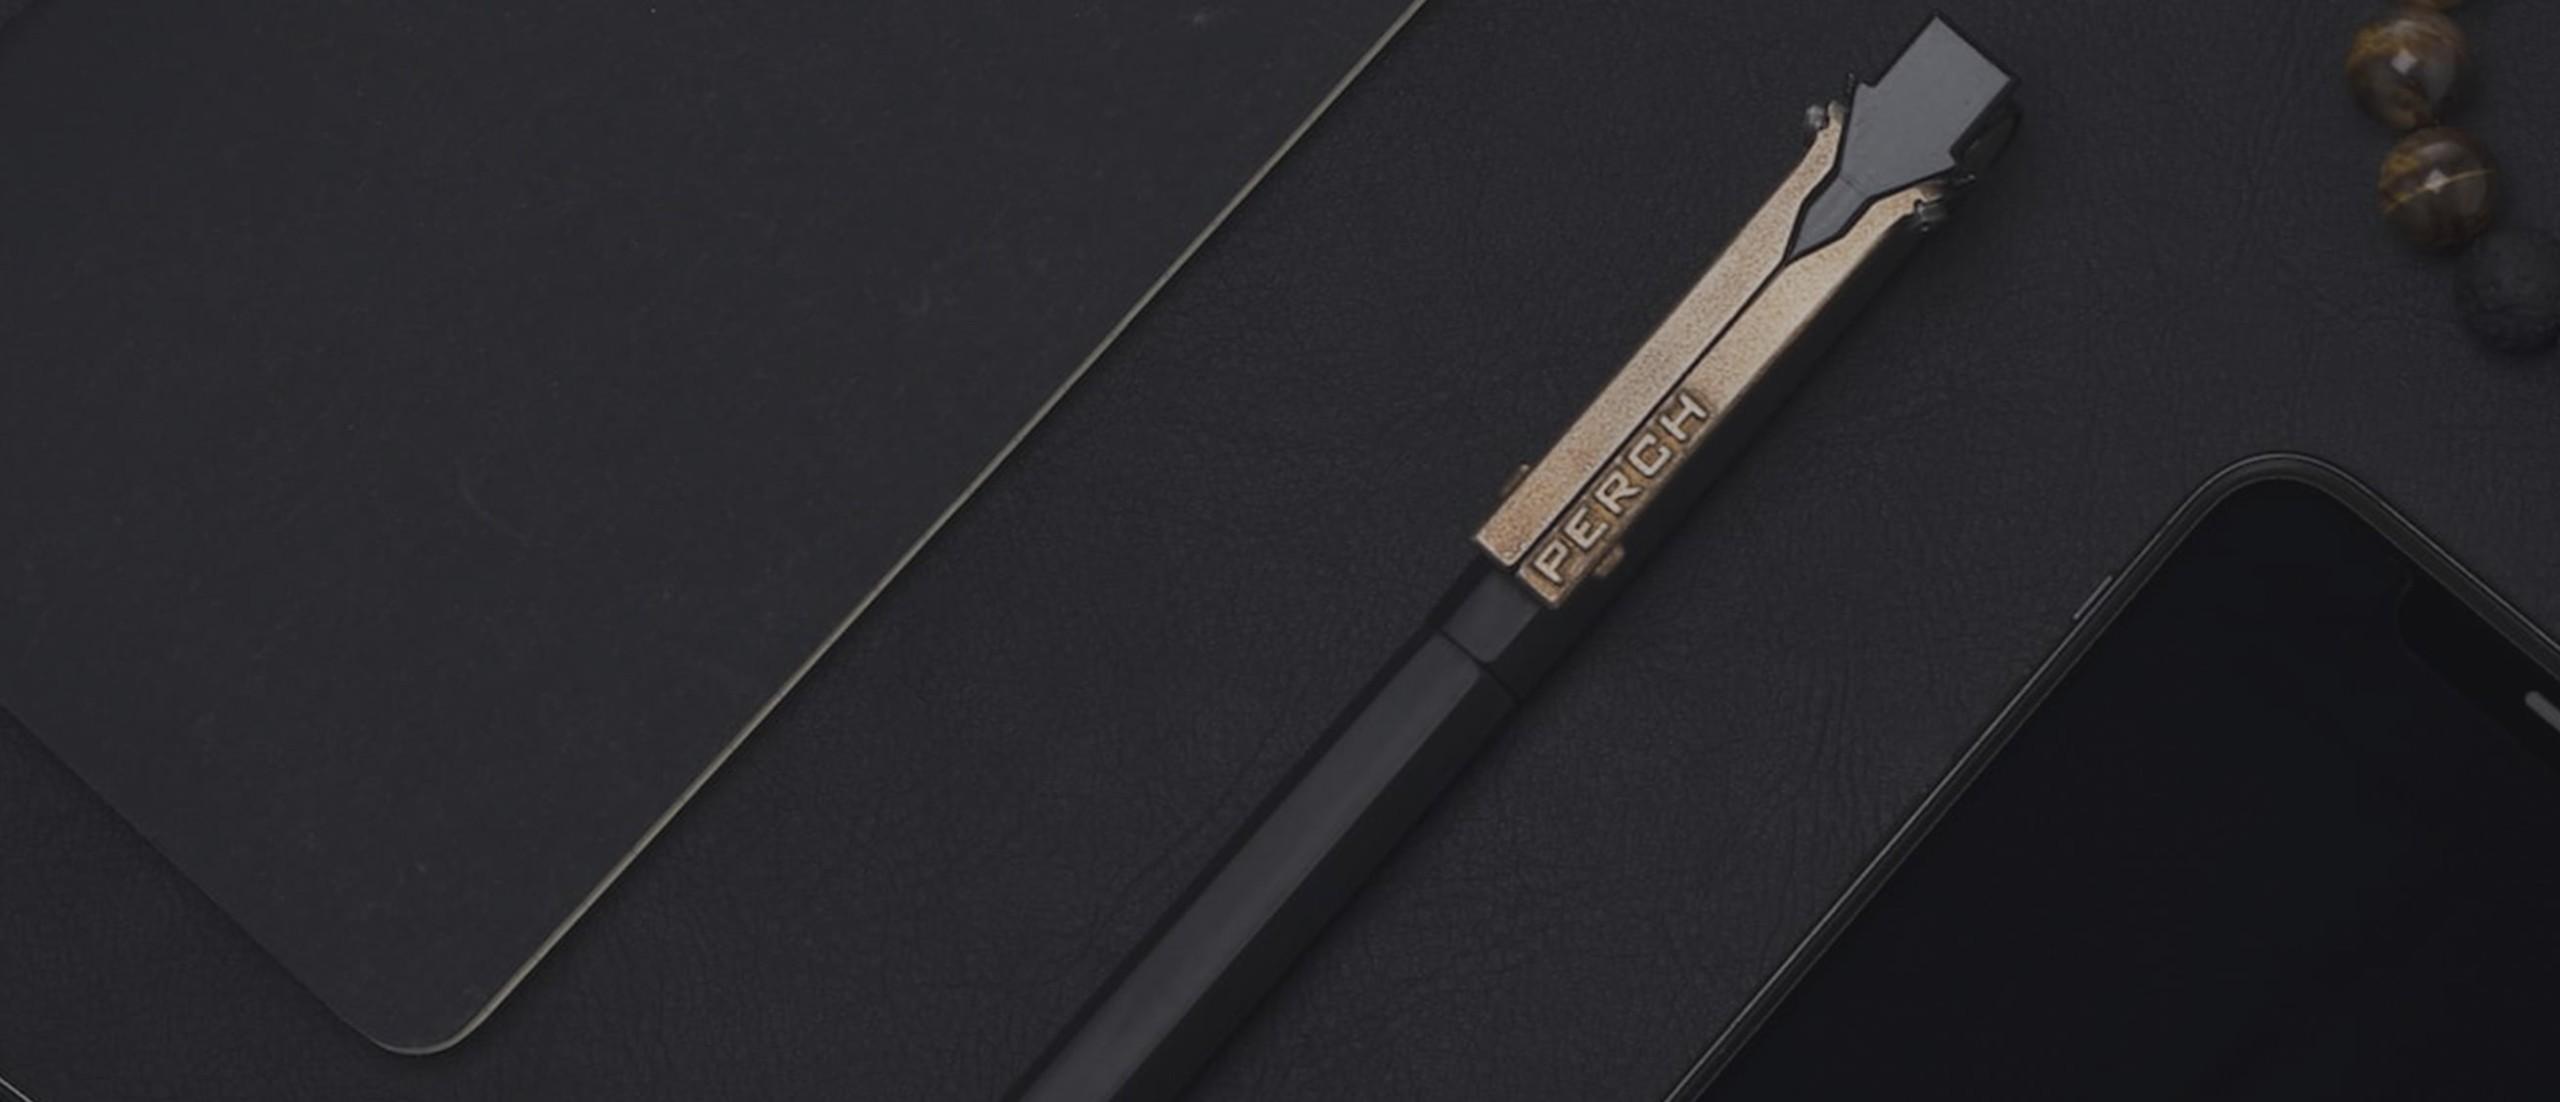 PerchPen Luxury Multi-Tool Smartphone Pen